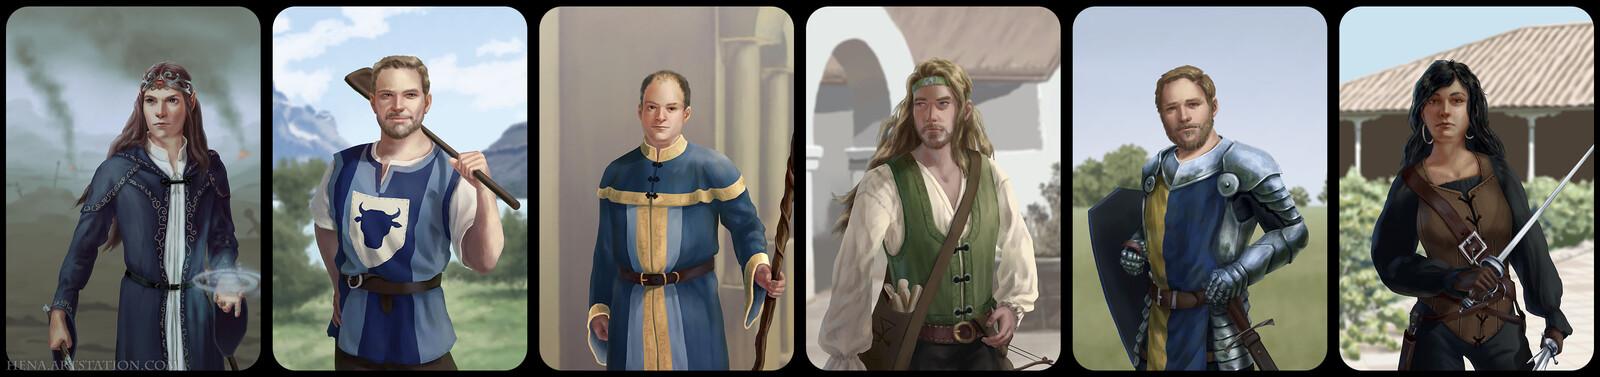 DSA: Character Portraits